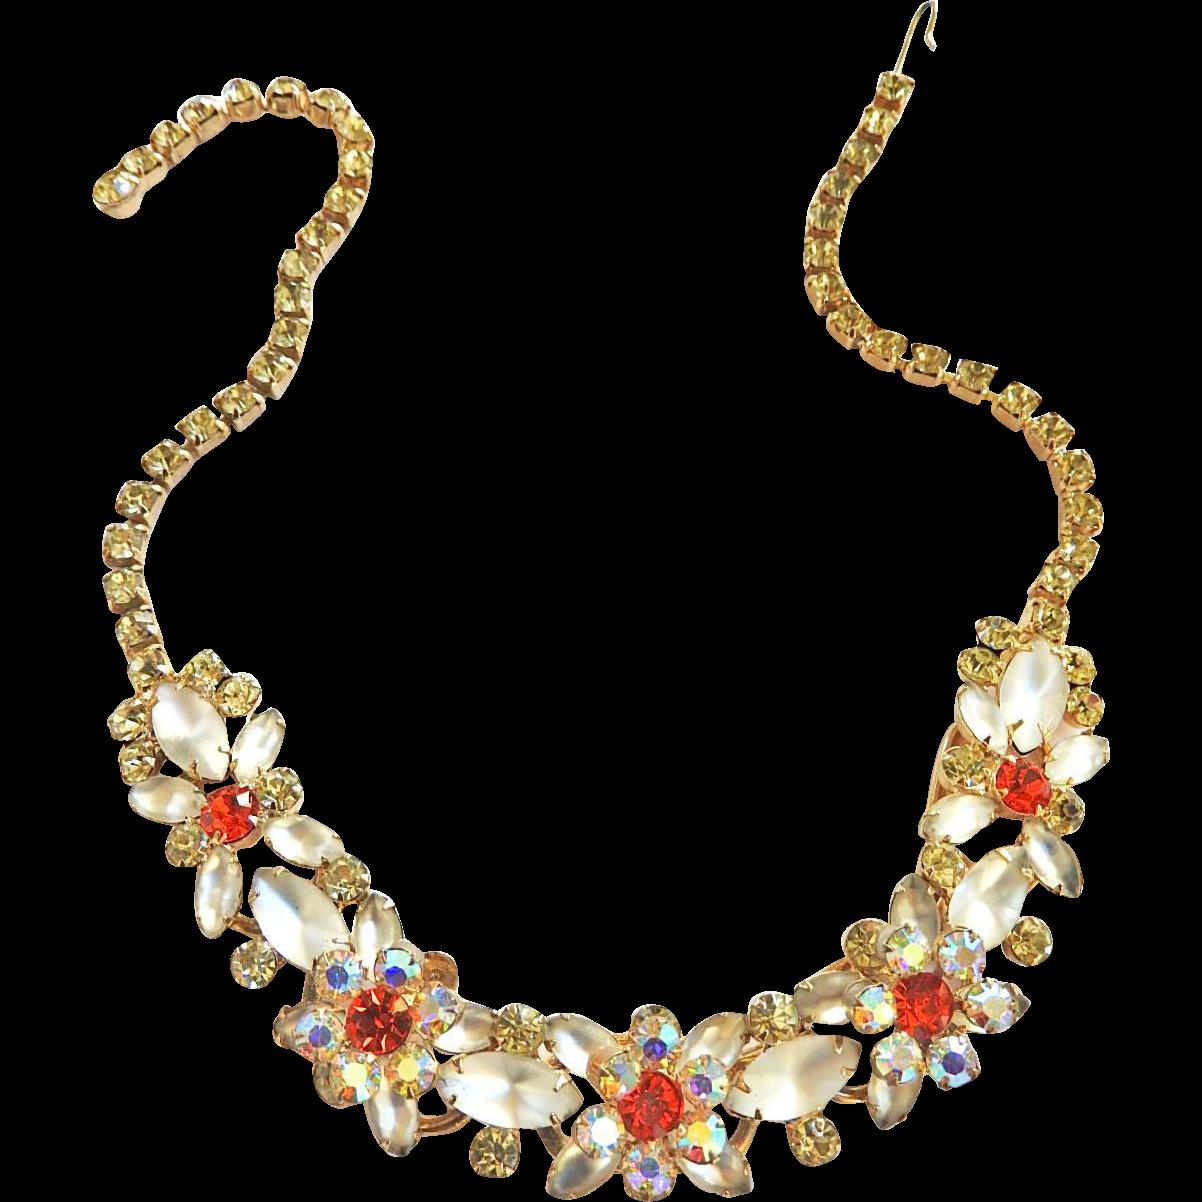 Vintage Juliana Hyacinth and Givre 5 Link Necklace